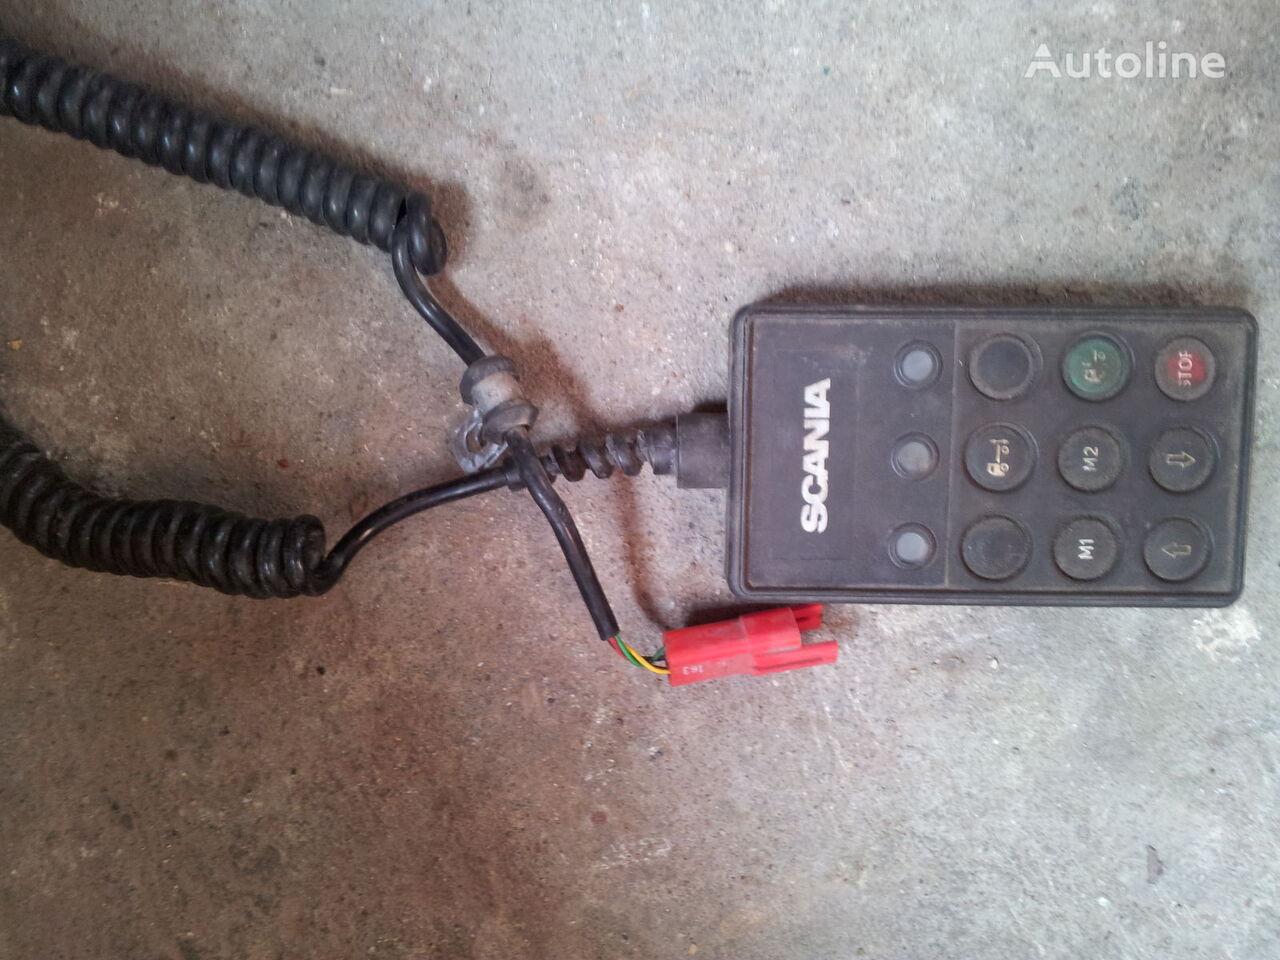 SCANIA R, T, P, G, L series EURO3, EURO4, EURO5, EURO6 axle lifting air mando a distancia de suspensión para SCANIA R, P, G, L series tractora